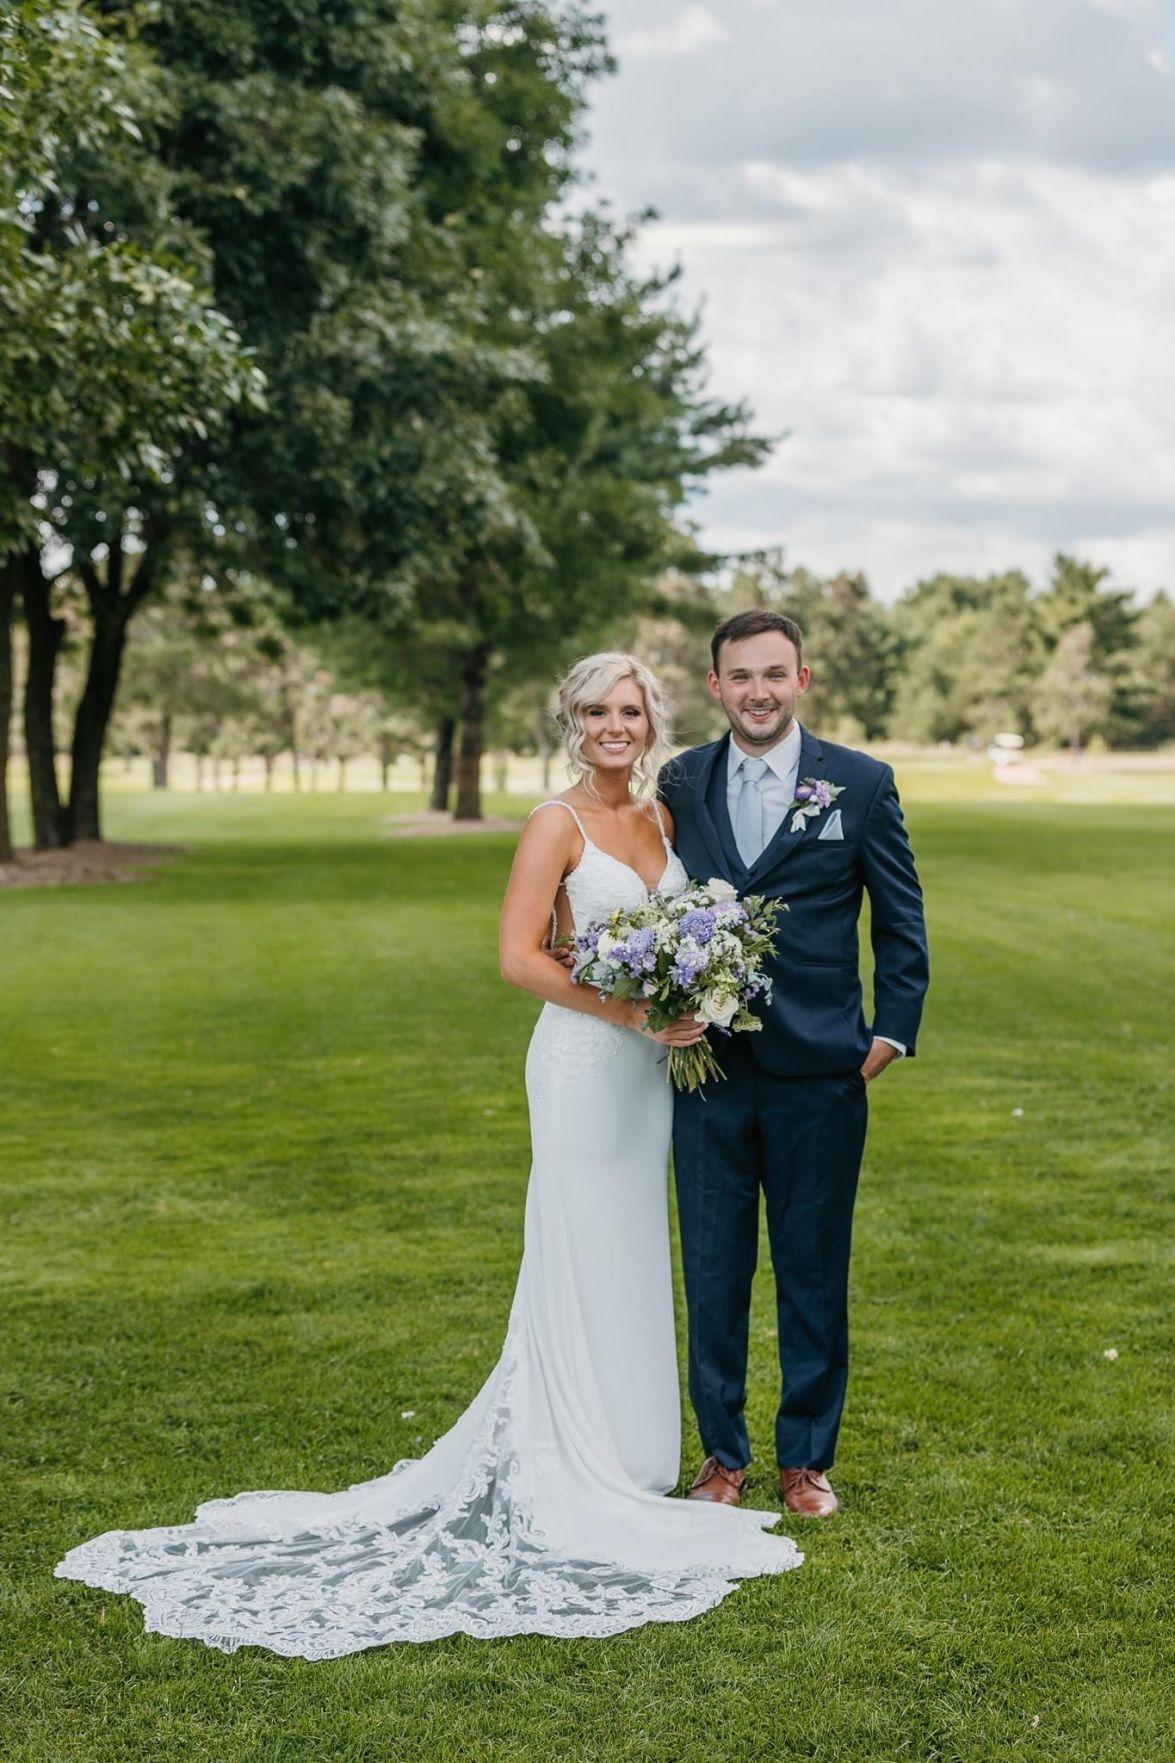 Carli Wedding.JPG